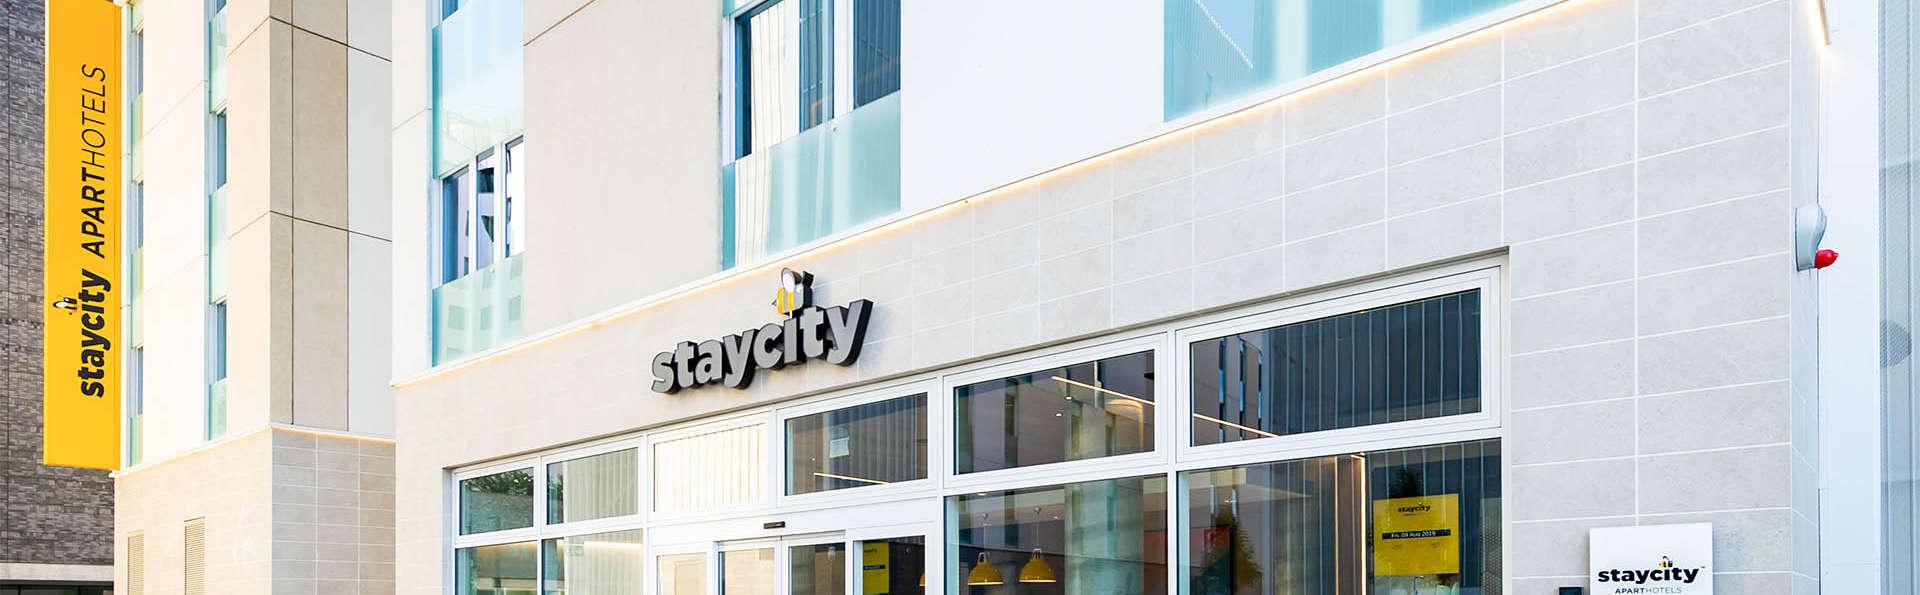 Staycity Aparthotel Venice Mestre - EDIT_Venice_01.jpg